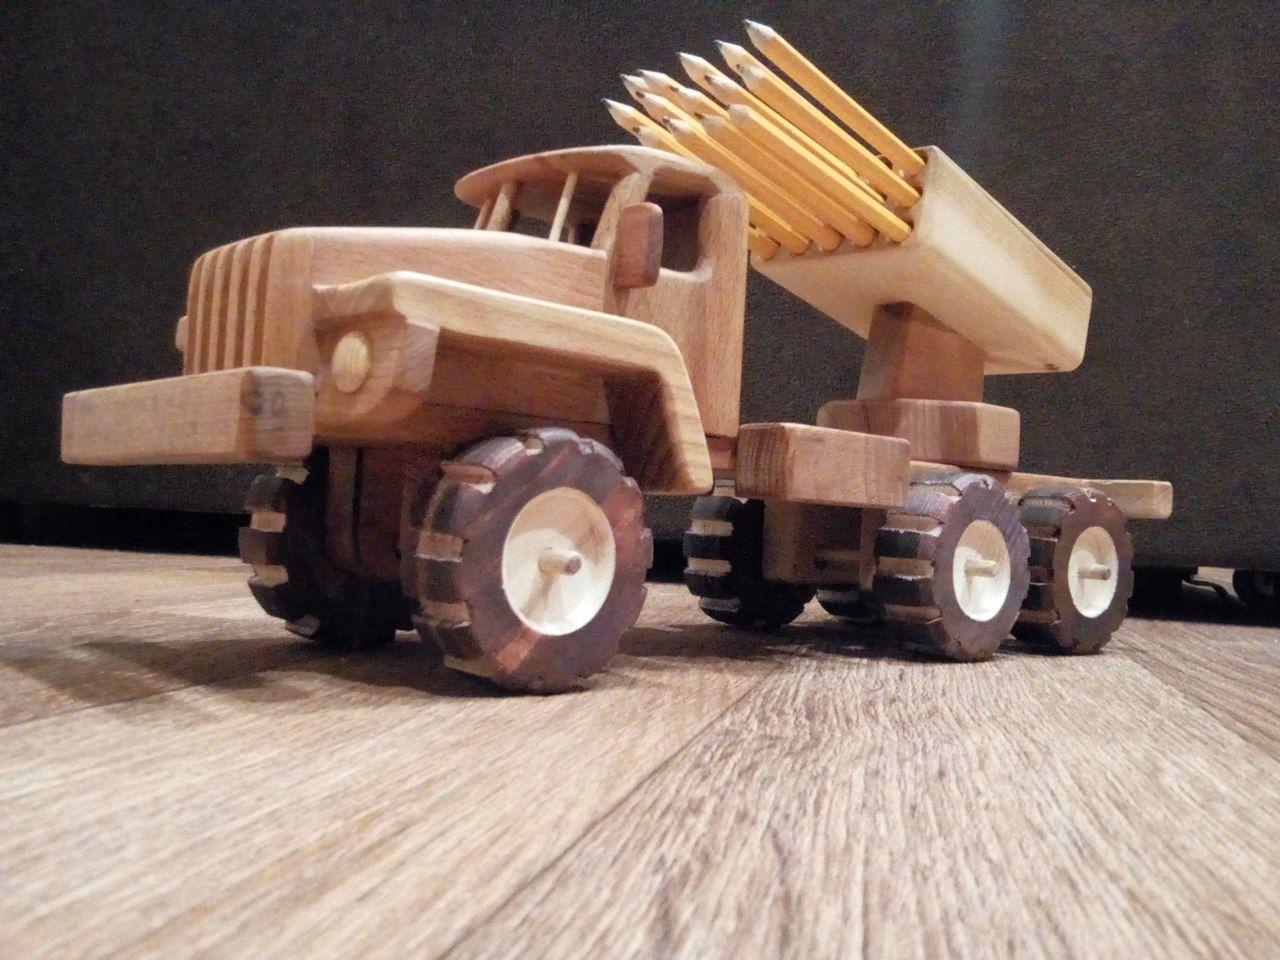 Wooden Toy Truck Plans : Pin by t c ahmet toprak on wood truck bus machine pinterest wood